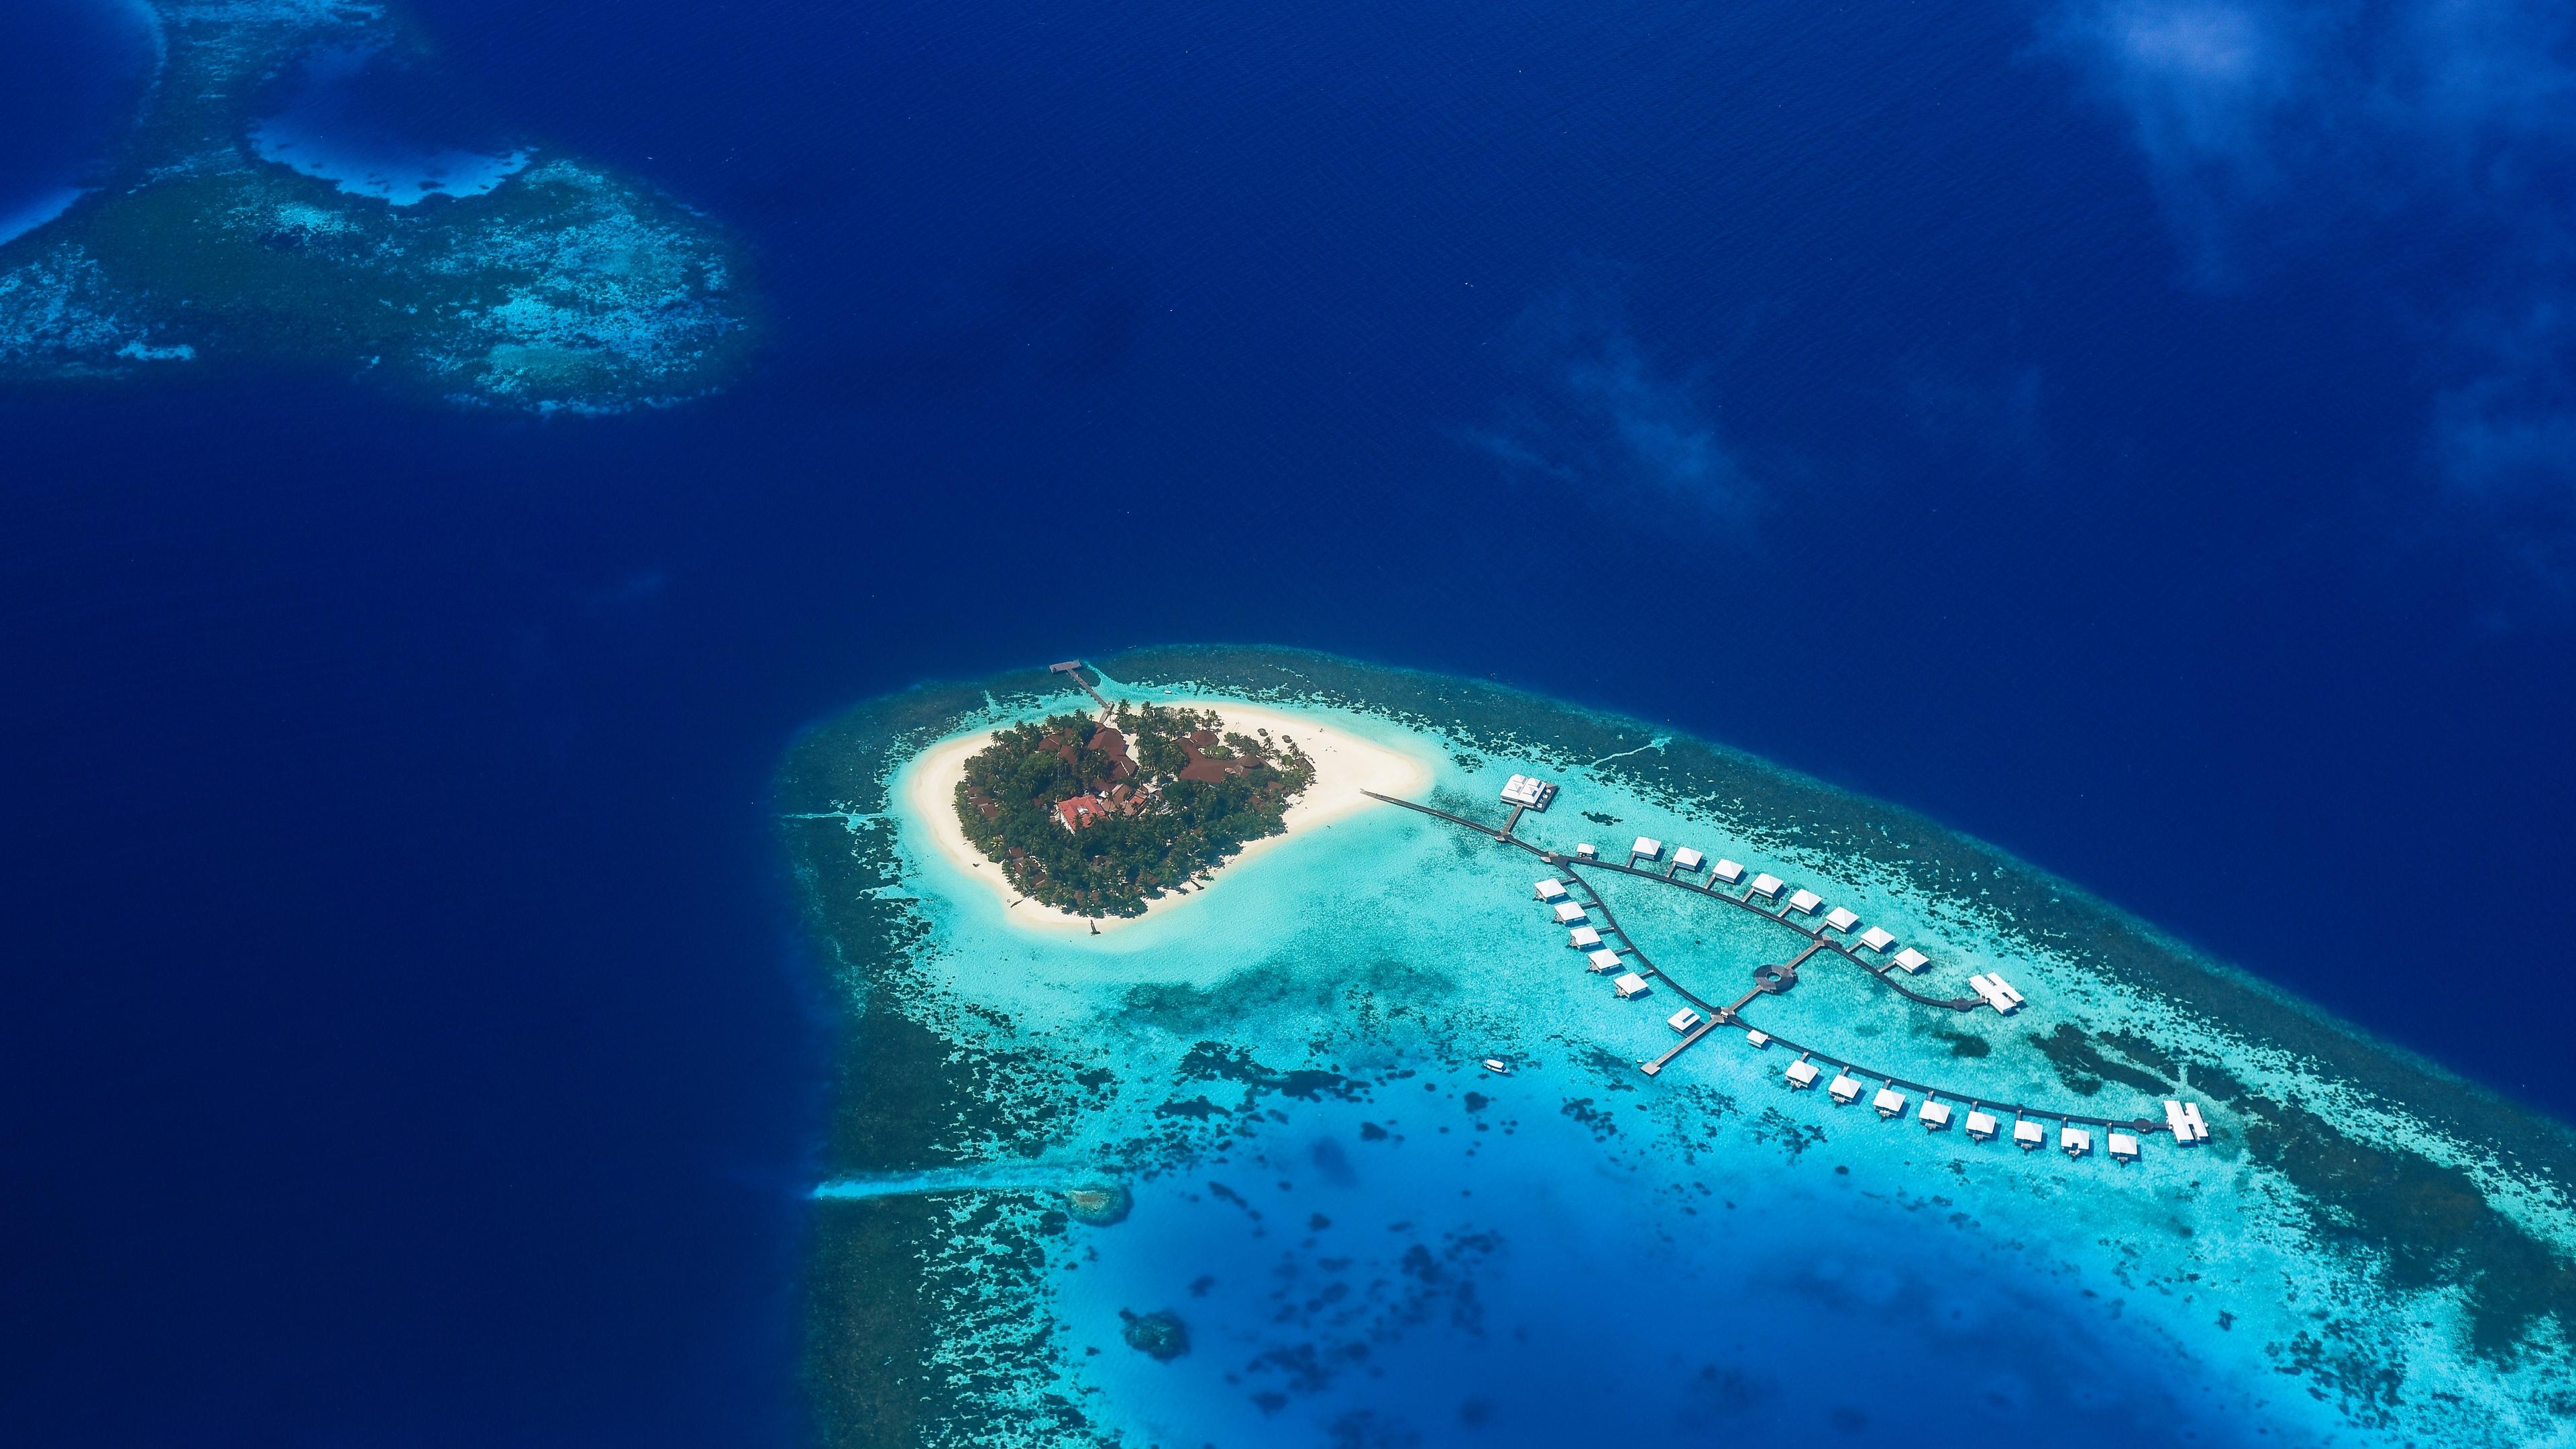 island ocean top view tropics paradise bay 4k 1541117302 - island, ocean, top view, tropics, paradise, bay 4k - top view, Ocean, Island